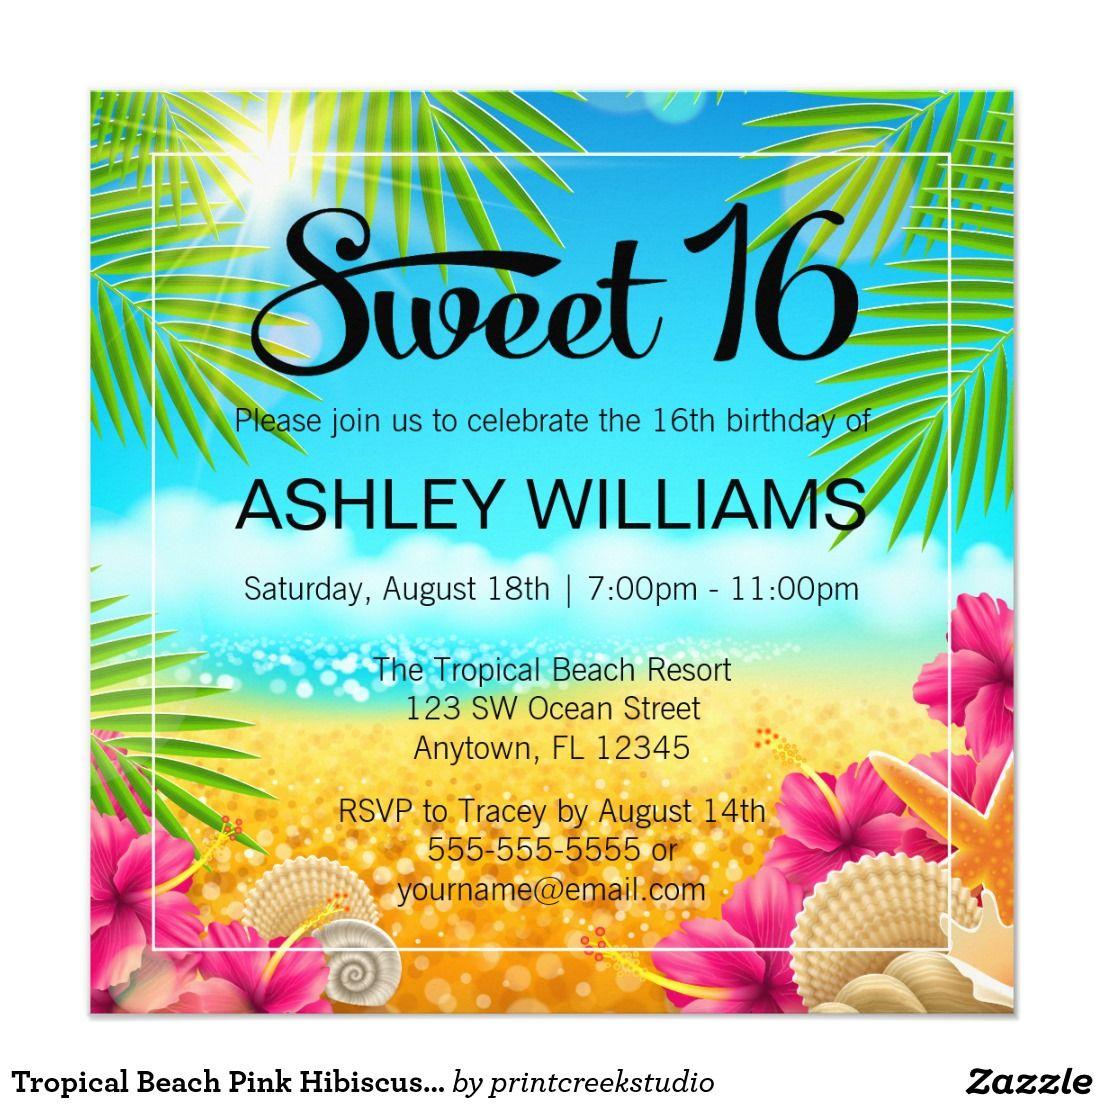 Tropical Beach Pink Hibiscus Sweet 16 Birthday Card | Sixteenth ...